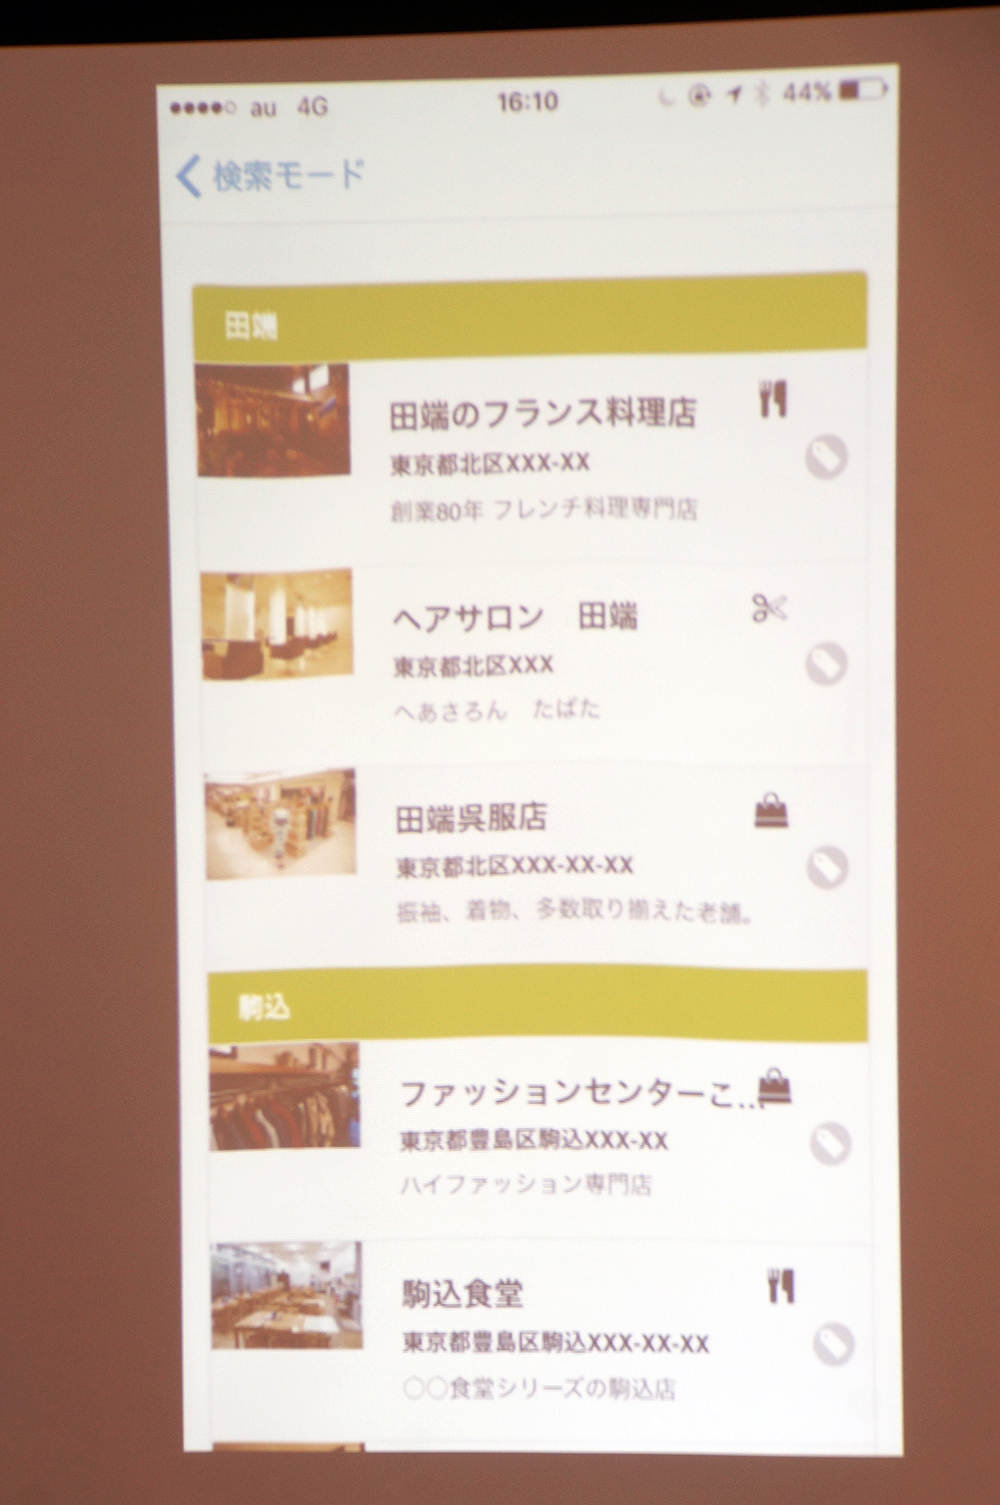 https://news.mynavi.jp/itsearch/2017/04/05/jre001.jpg